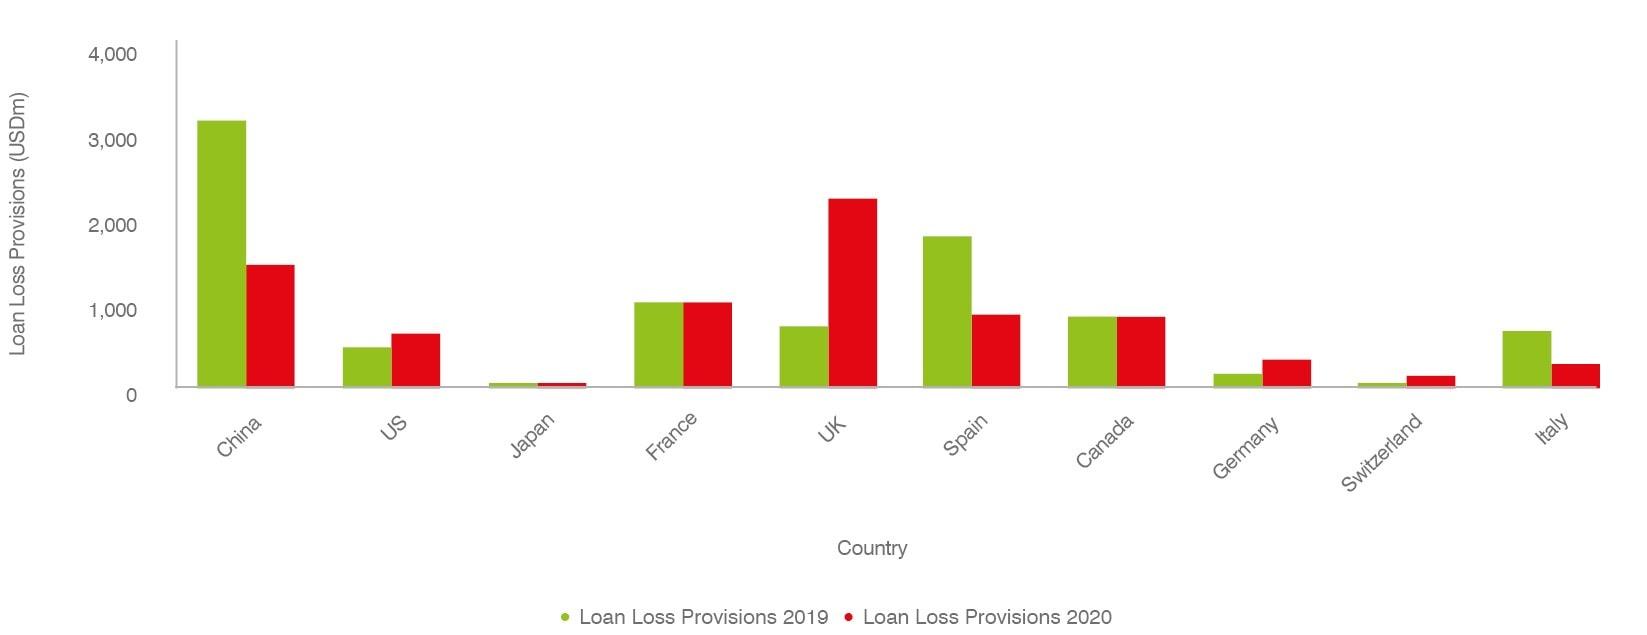 Loan Loss Provisions - Average per Bank (USDm)